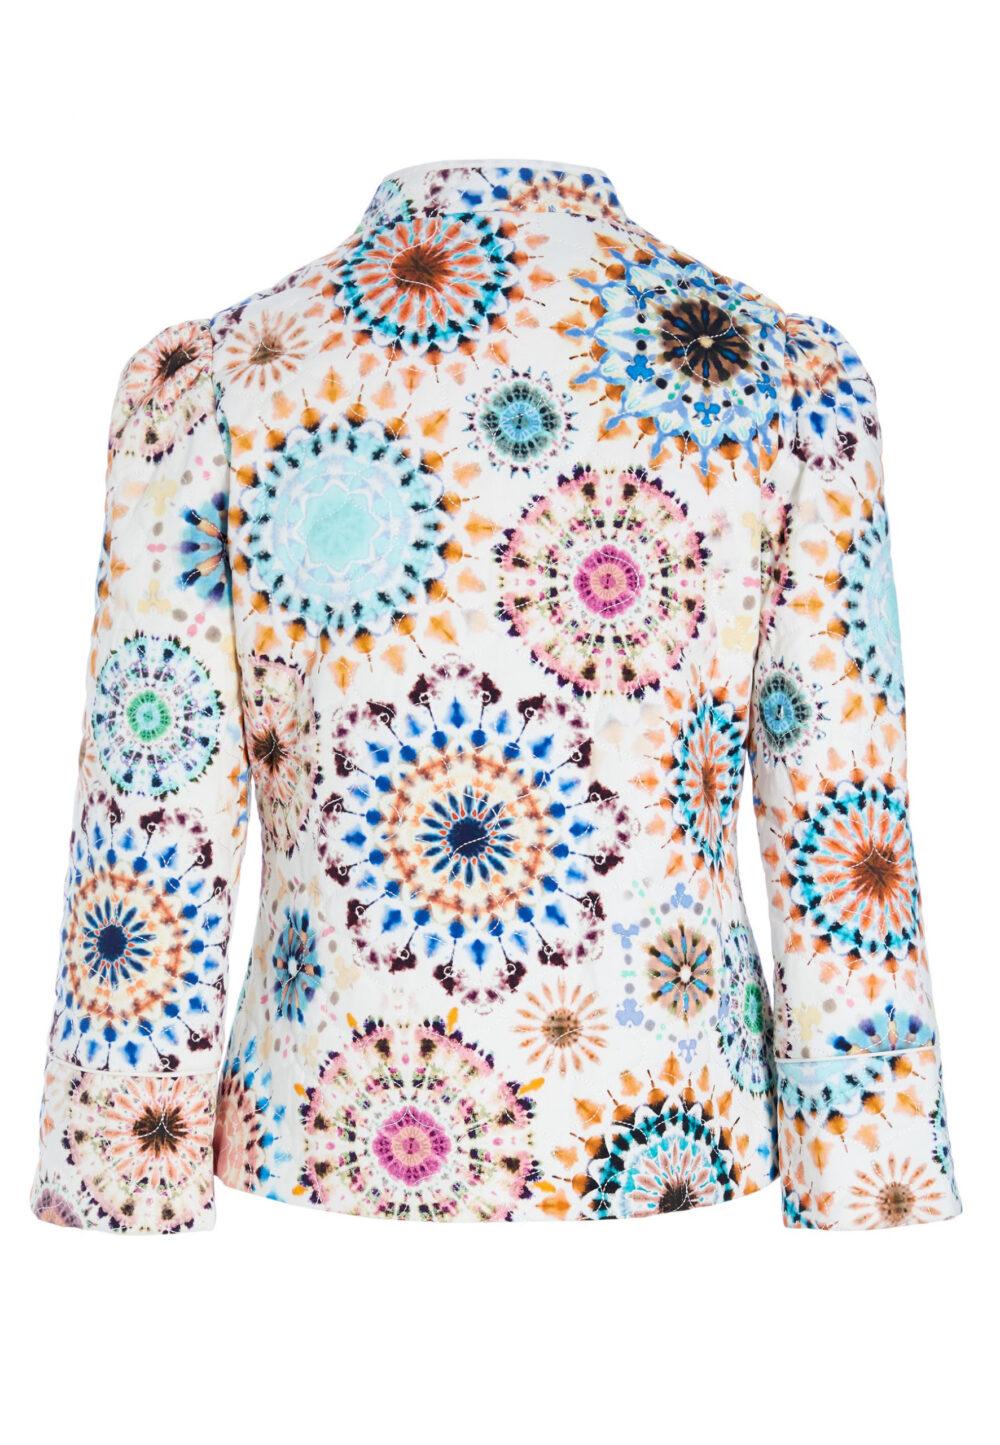 Dea Kudibal quilted jakke Rosy Kaleidoscope 1 scaled